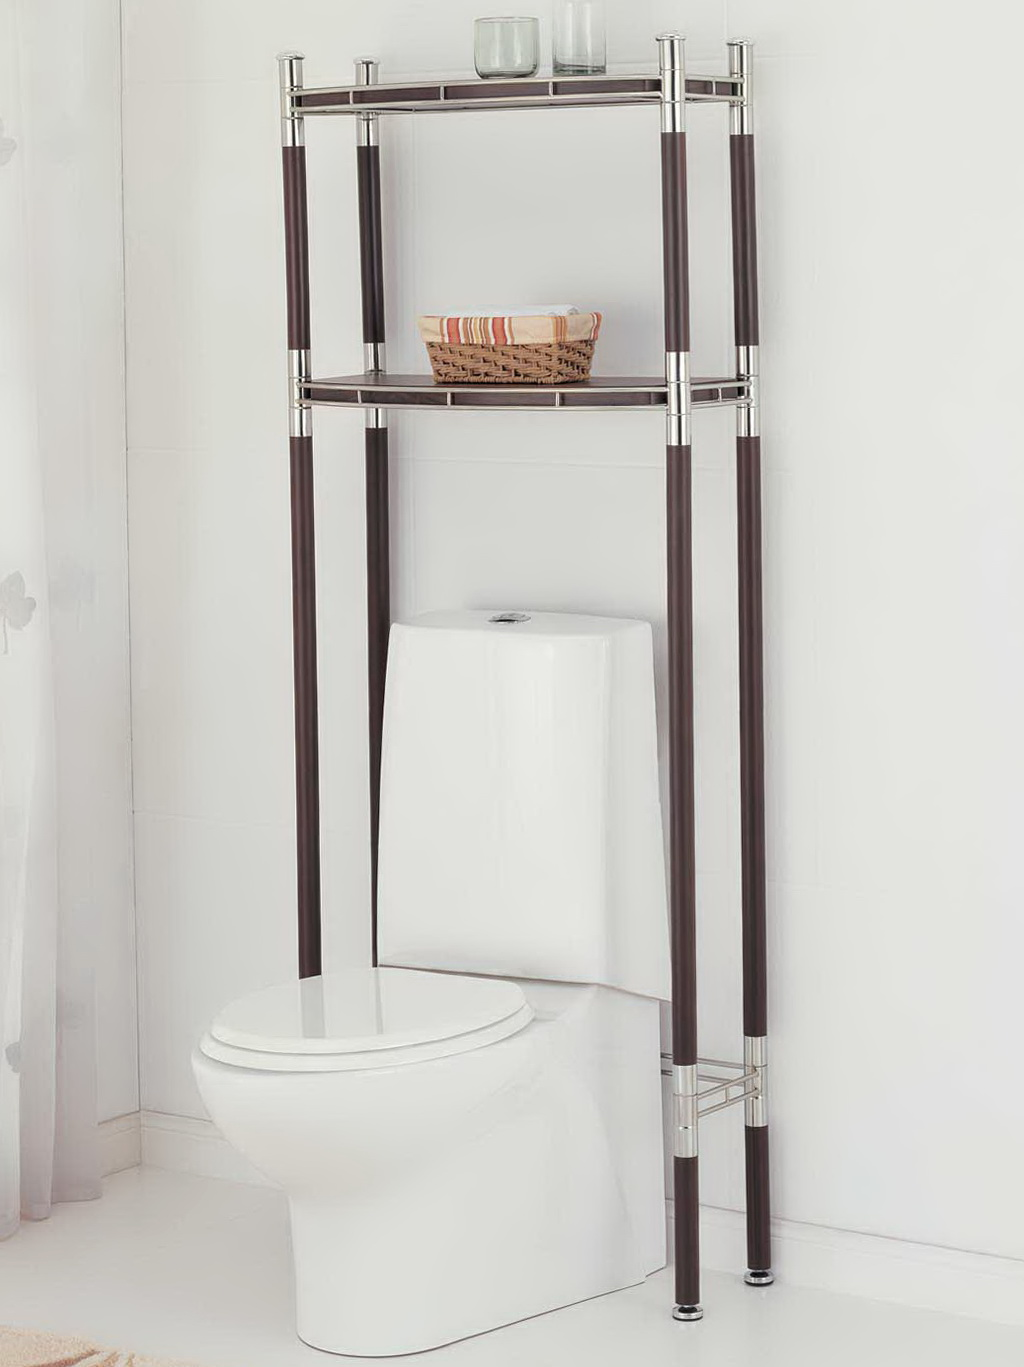 Bathroom Space Saver Over Toilet Ikea